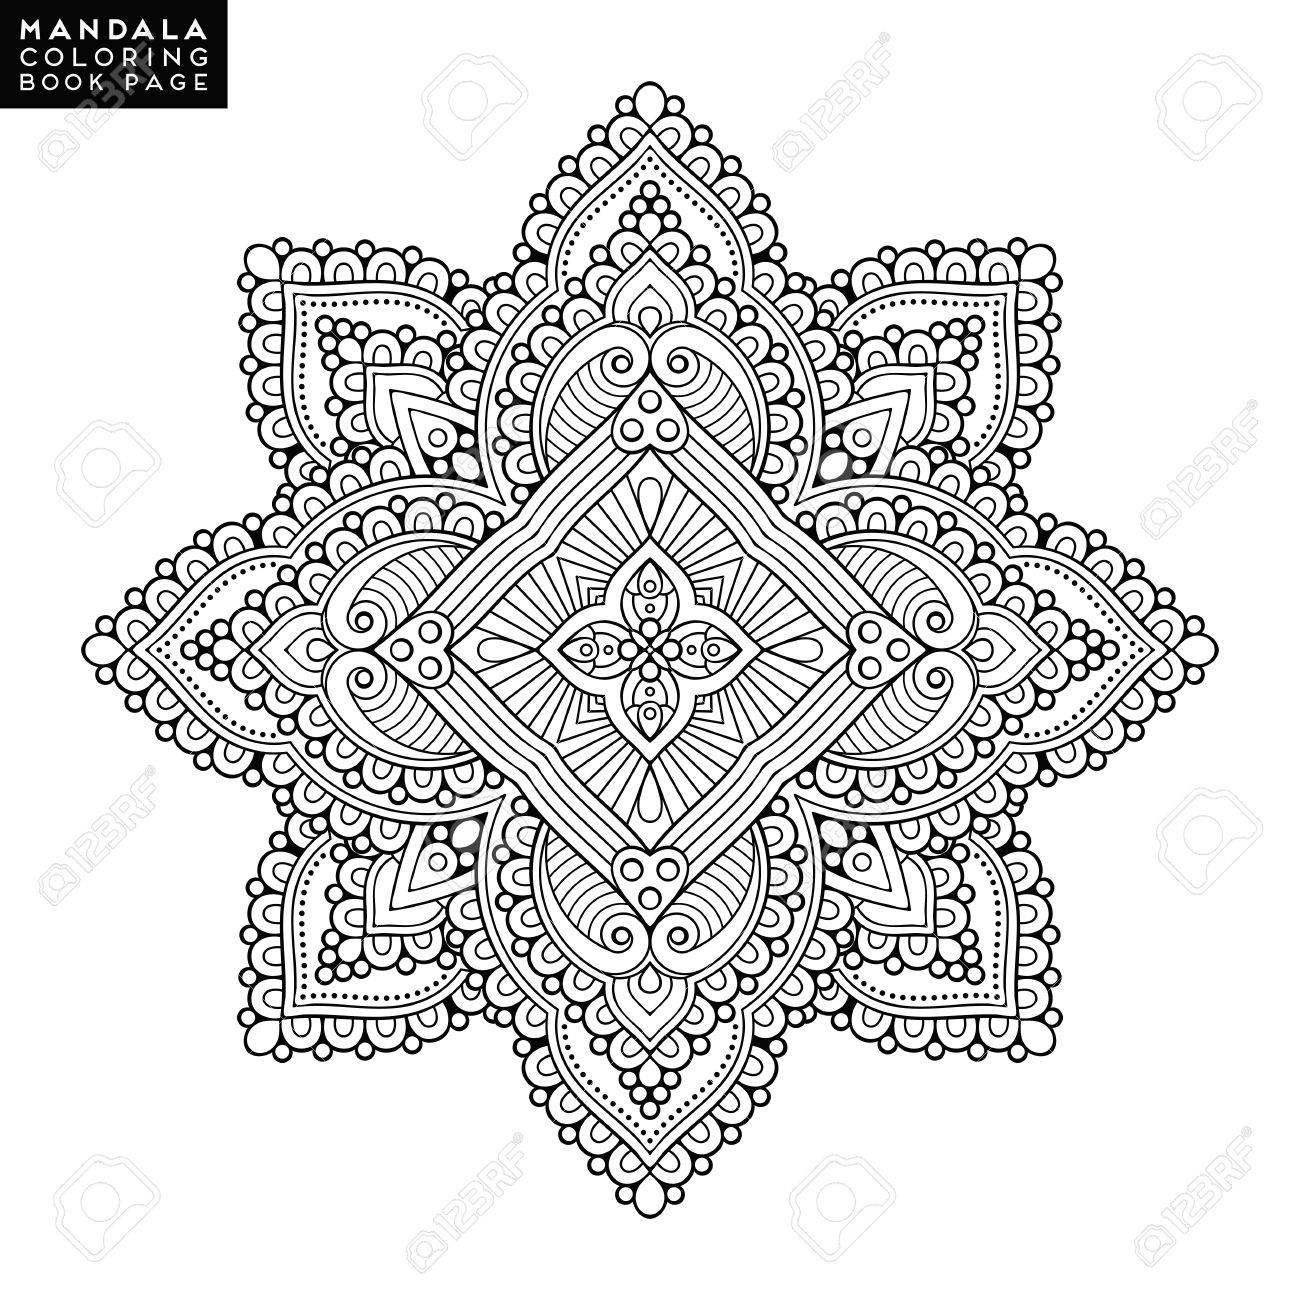 Coloring Book Page Flower Mandala Vintage Decorative Elements Oriental Pattern Vector Illustration Islam Arabic